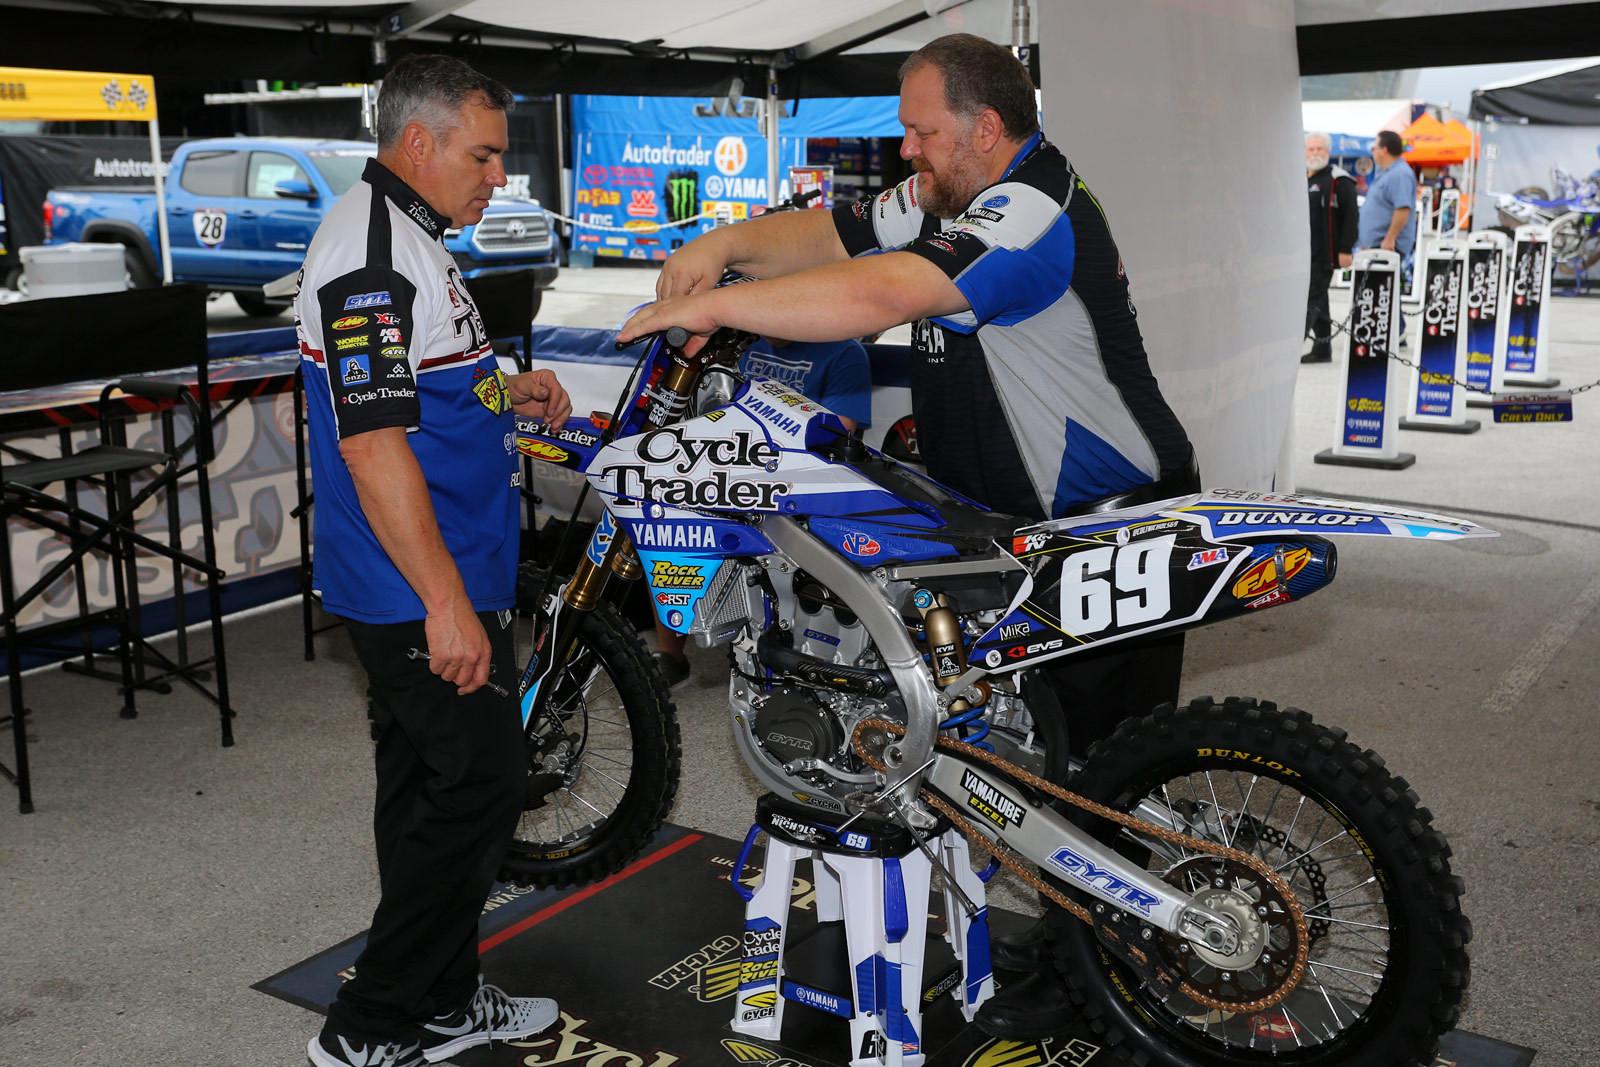 Scott Rabon and Dan Rambert - Vital MX Pit Bits: Arlington - Motocross Pictures - Vital MX